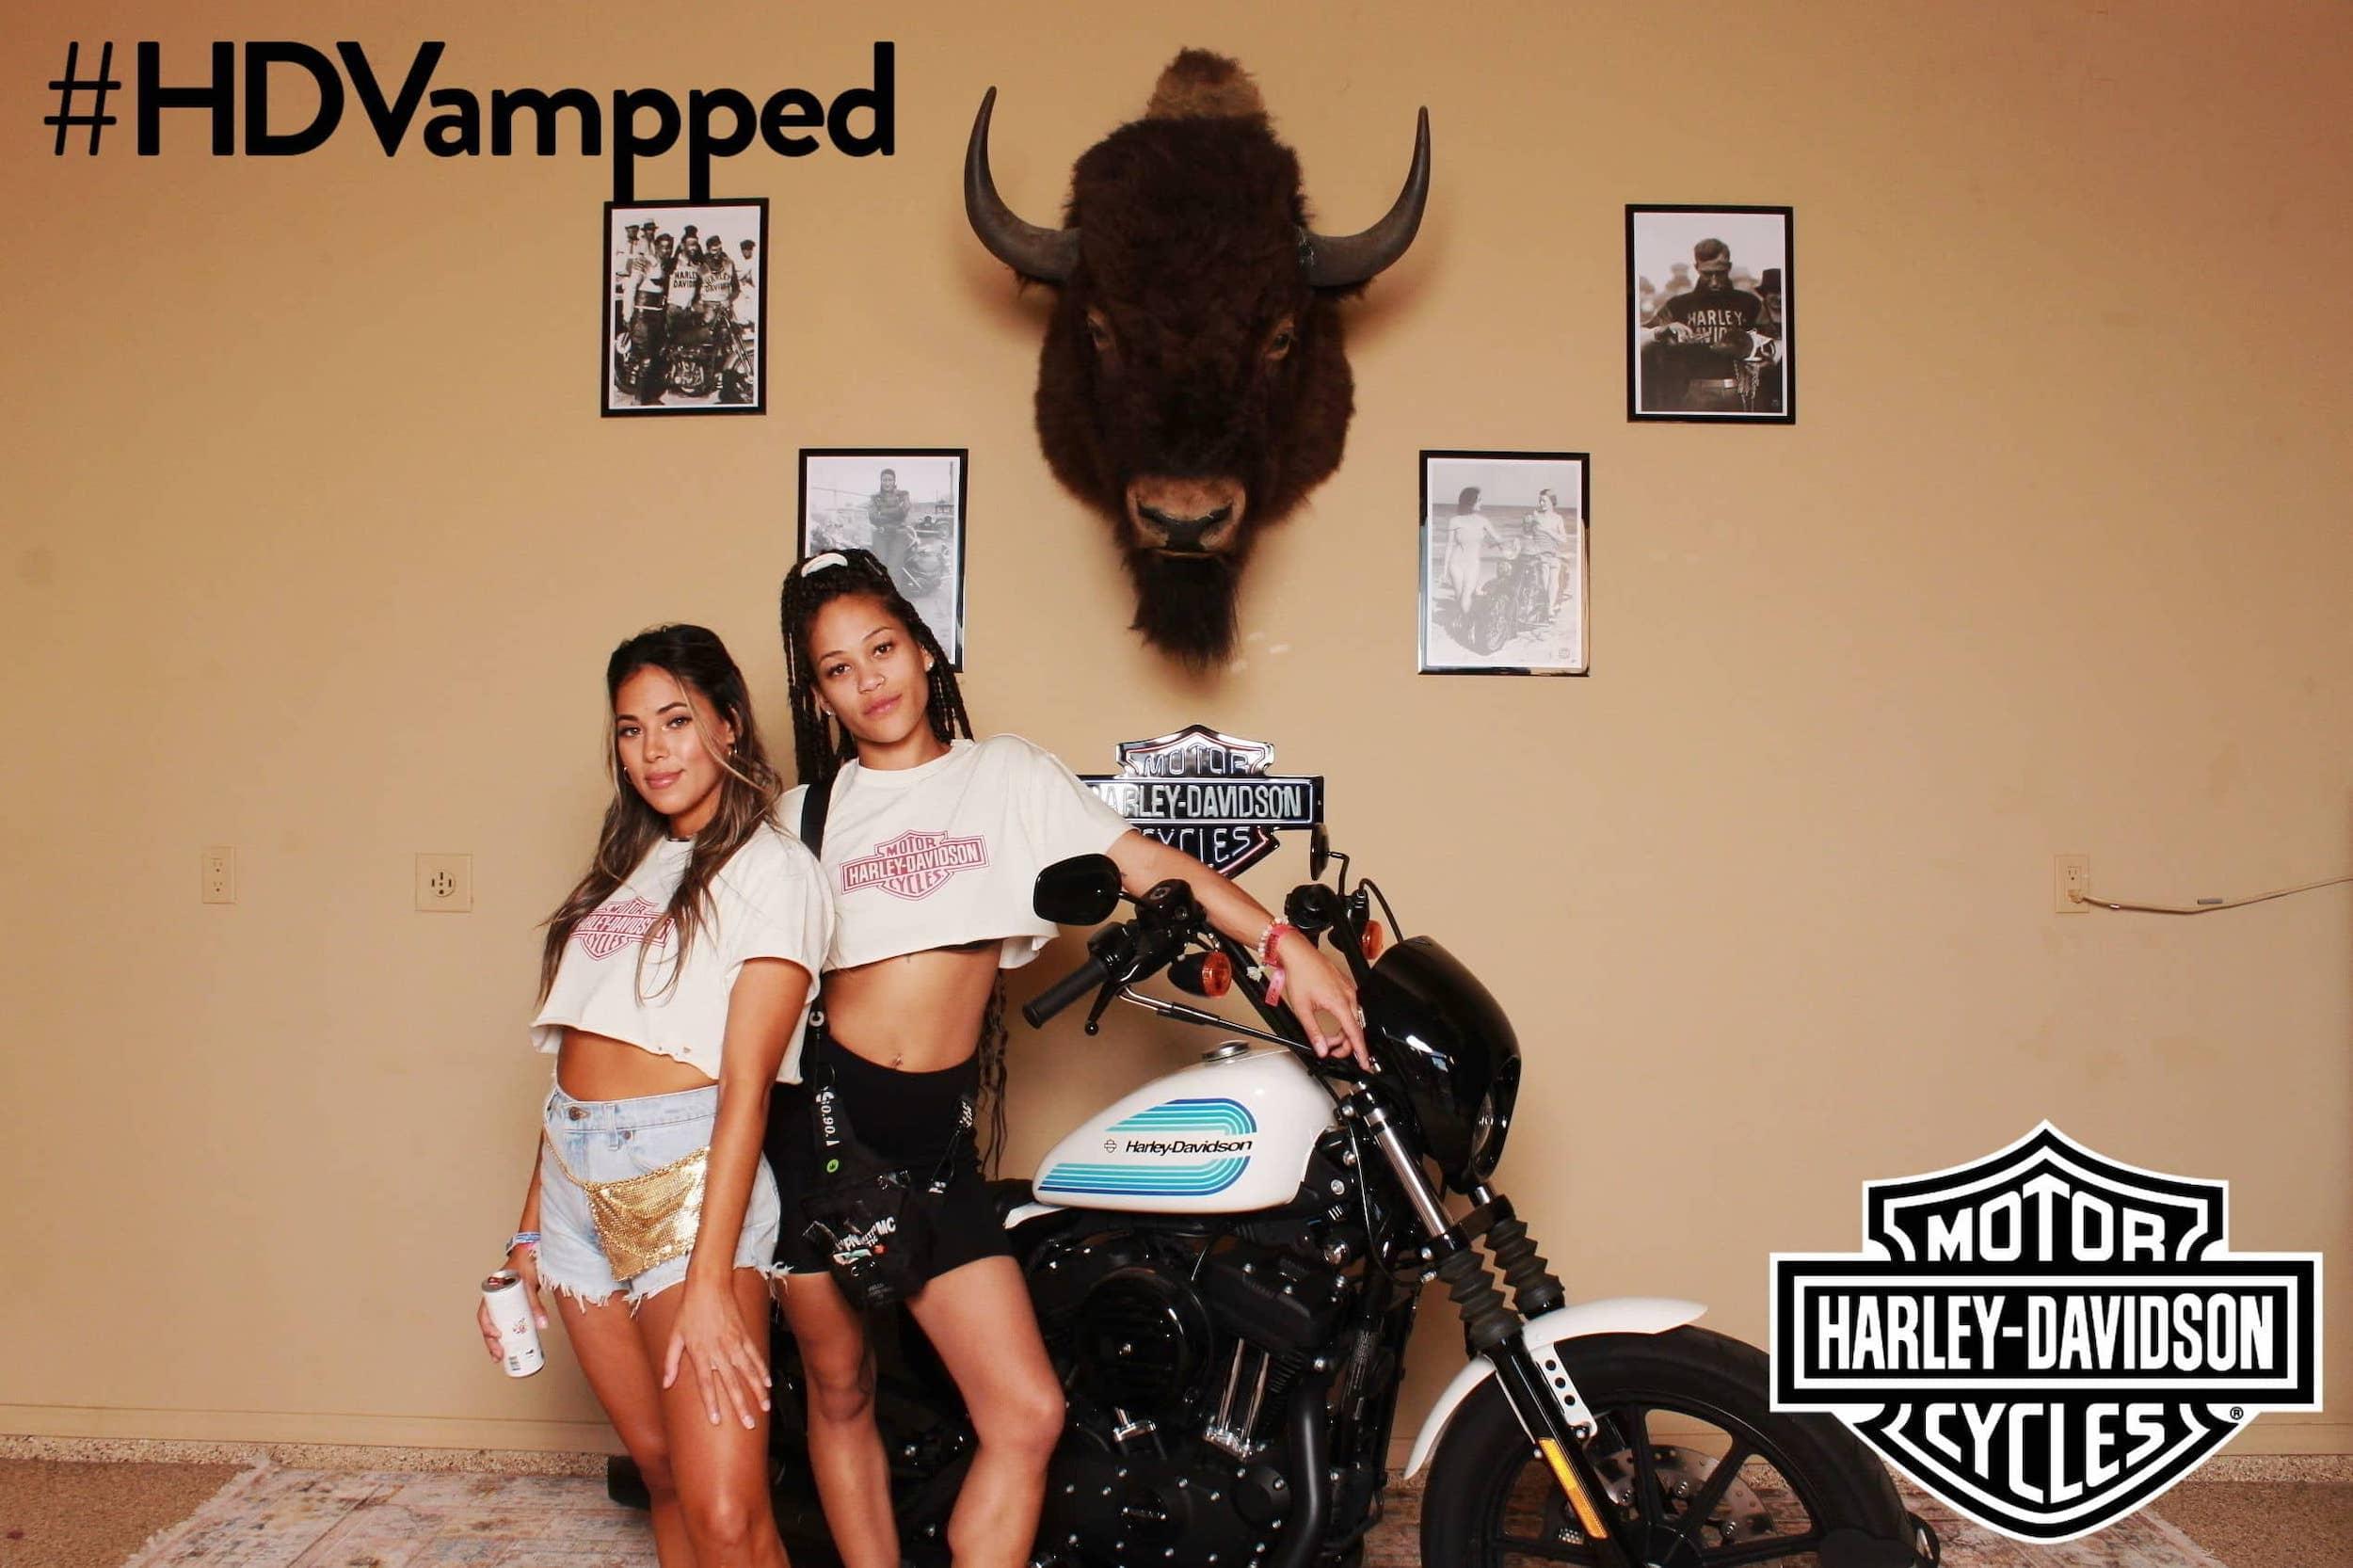 Coachella Harley Davidson photo booth